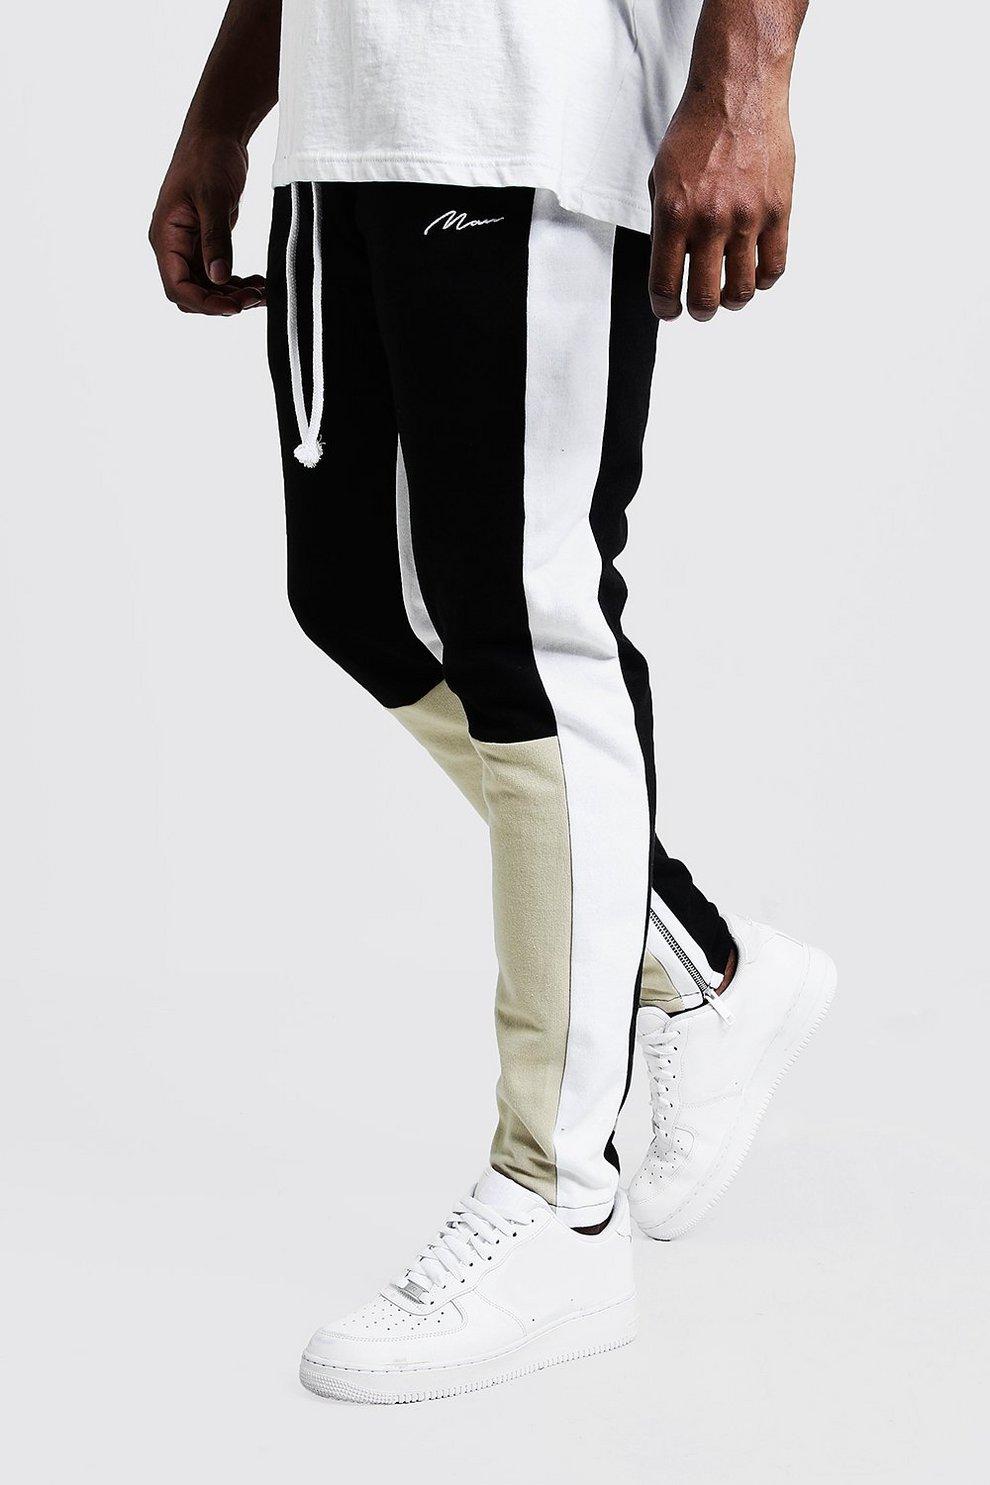 d2f653283c4093 Mens Taupe Big & Tall Skinny Fit MAN Colour Block Joggers